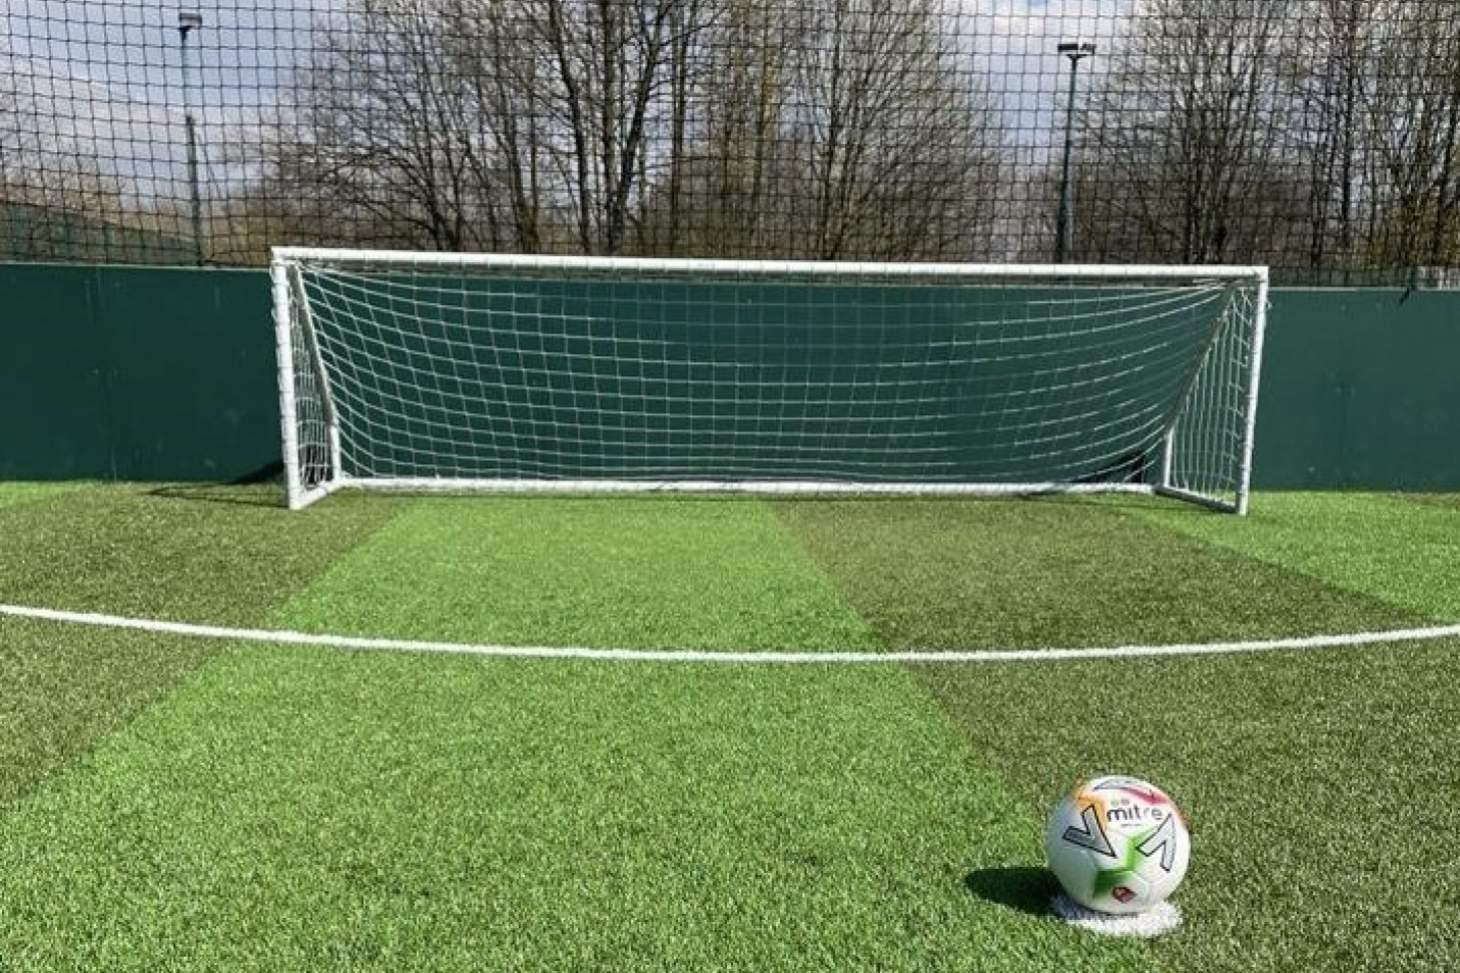 Powerleague Bolton 5 a side | 3G Astroturf football pitch